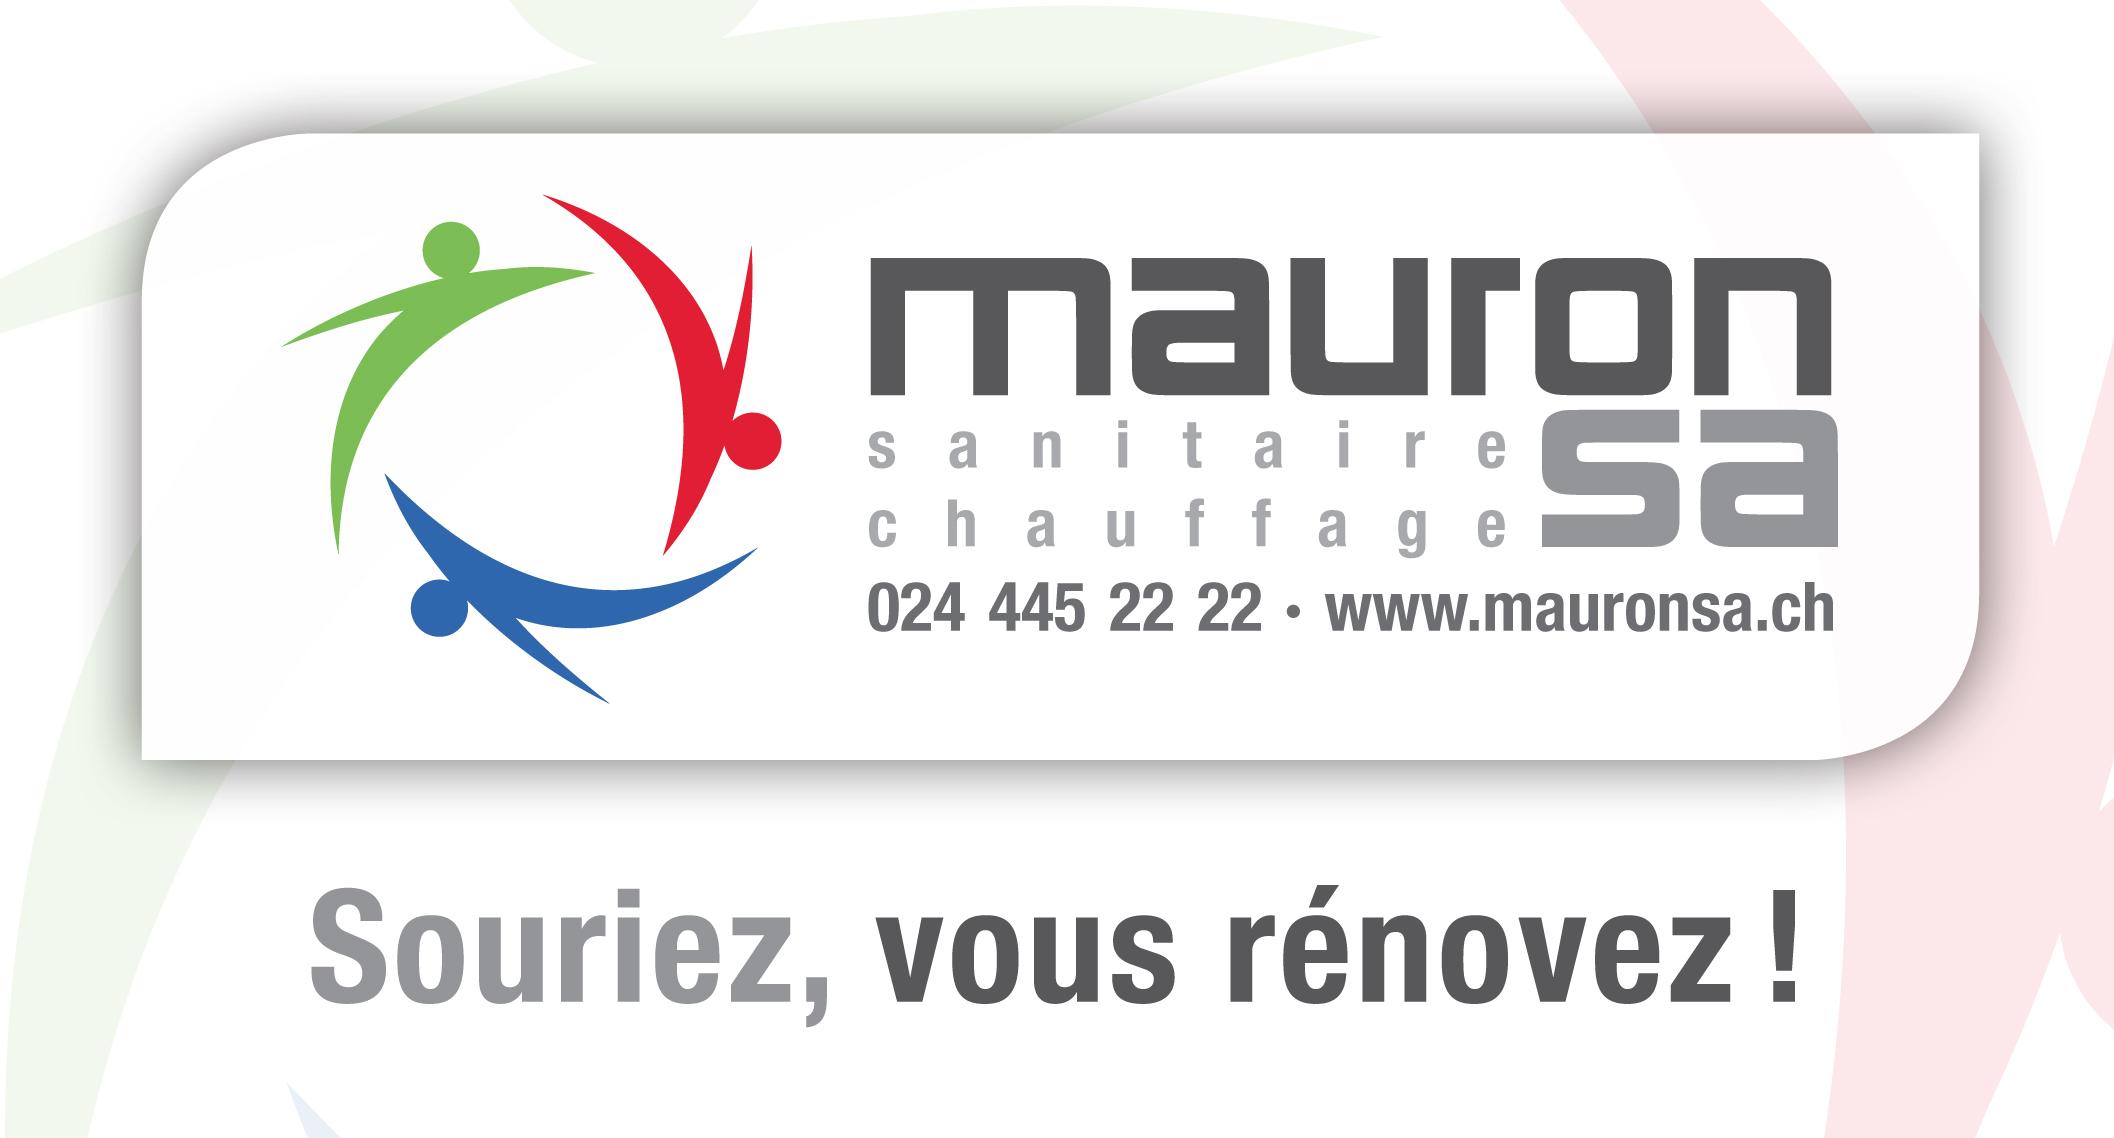 MAURON SA